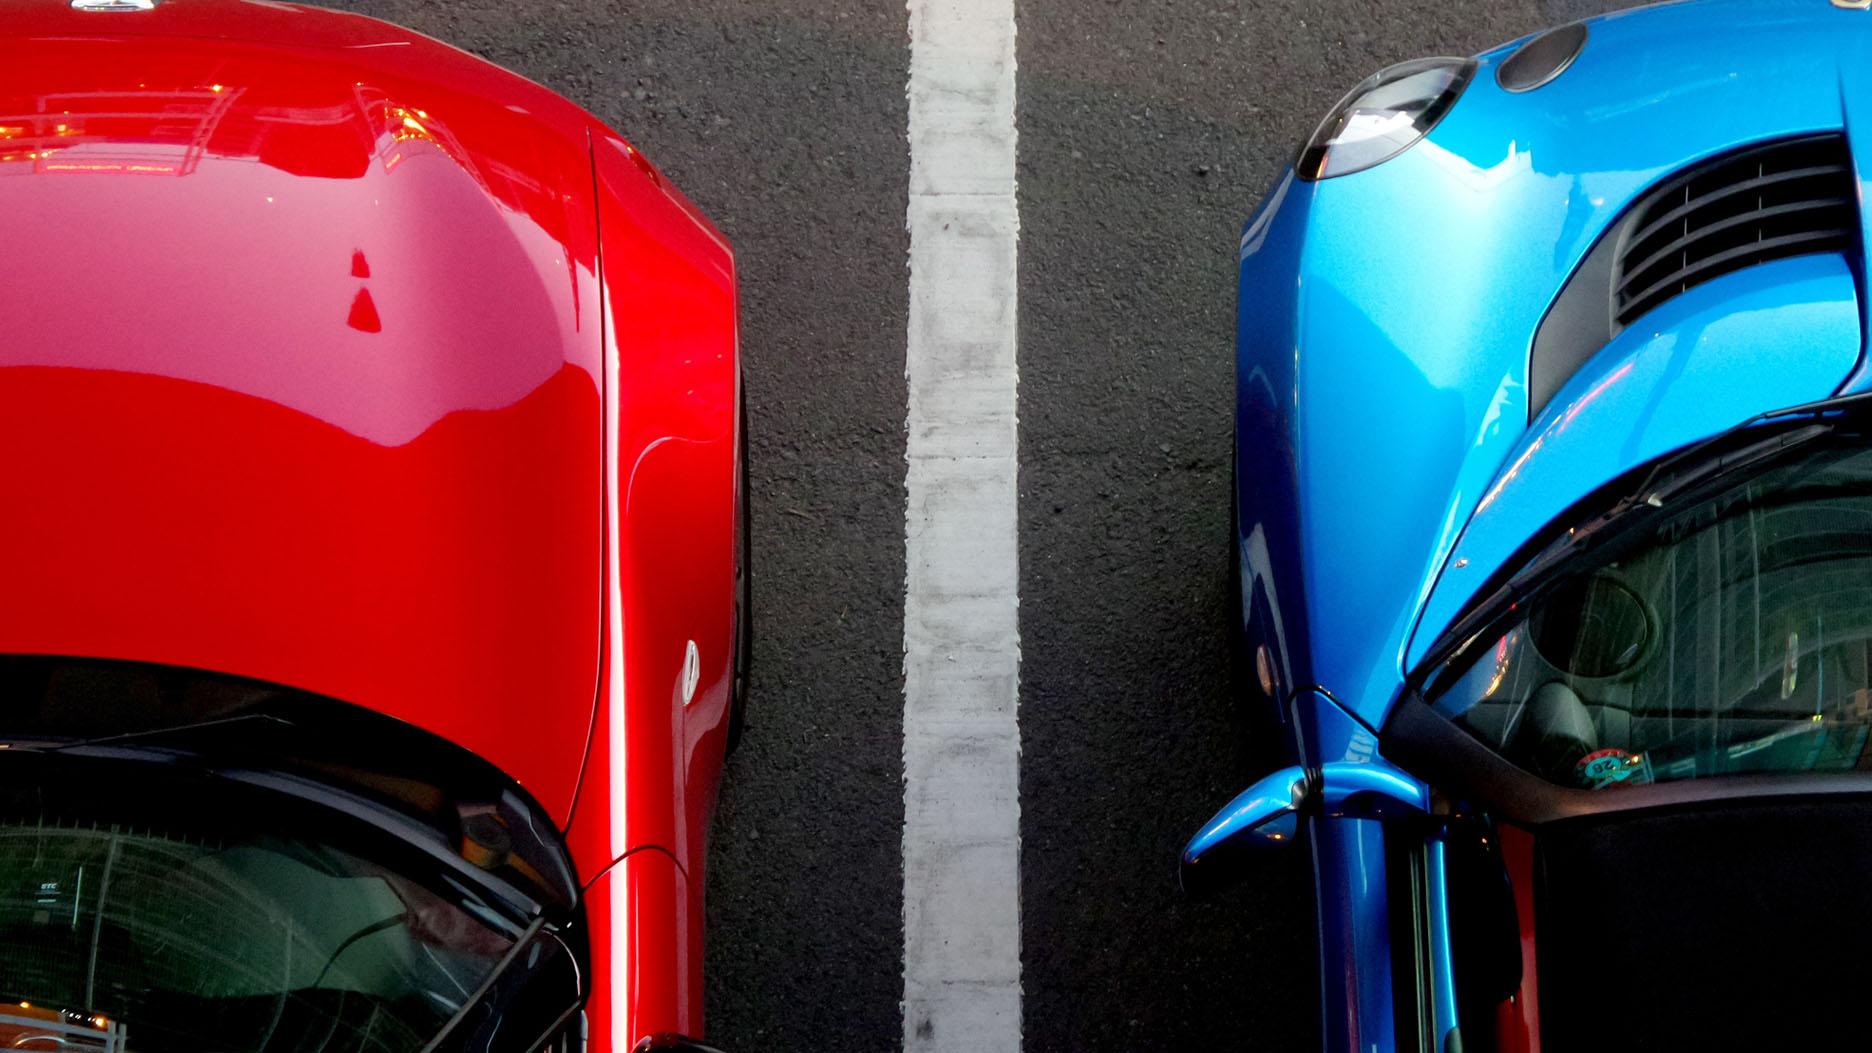 Car Hire Red Car Blue Car Parking Lot Book Online